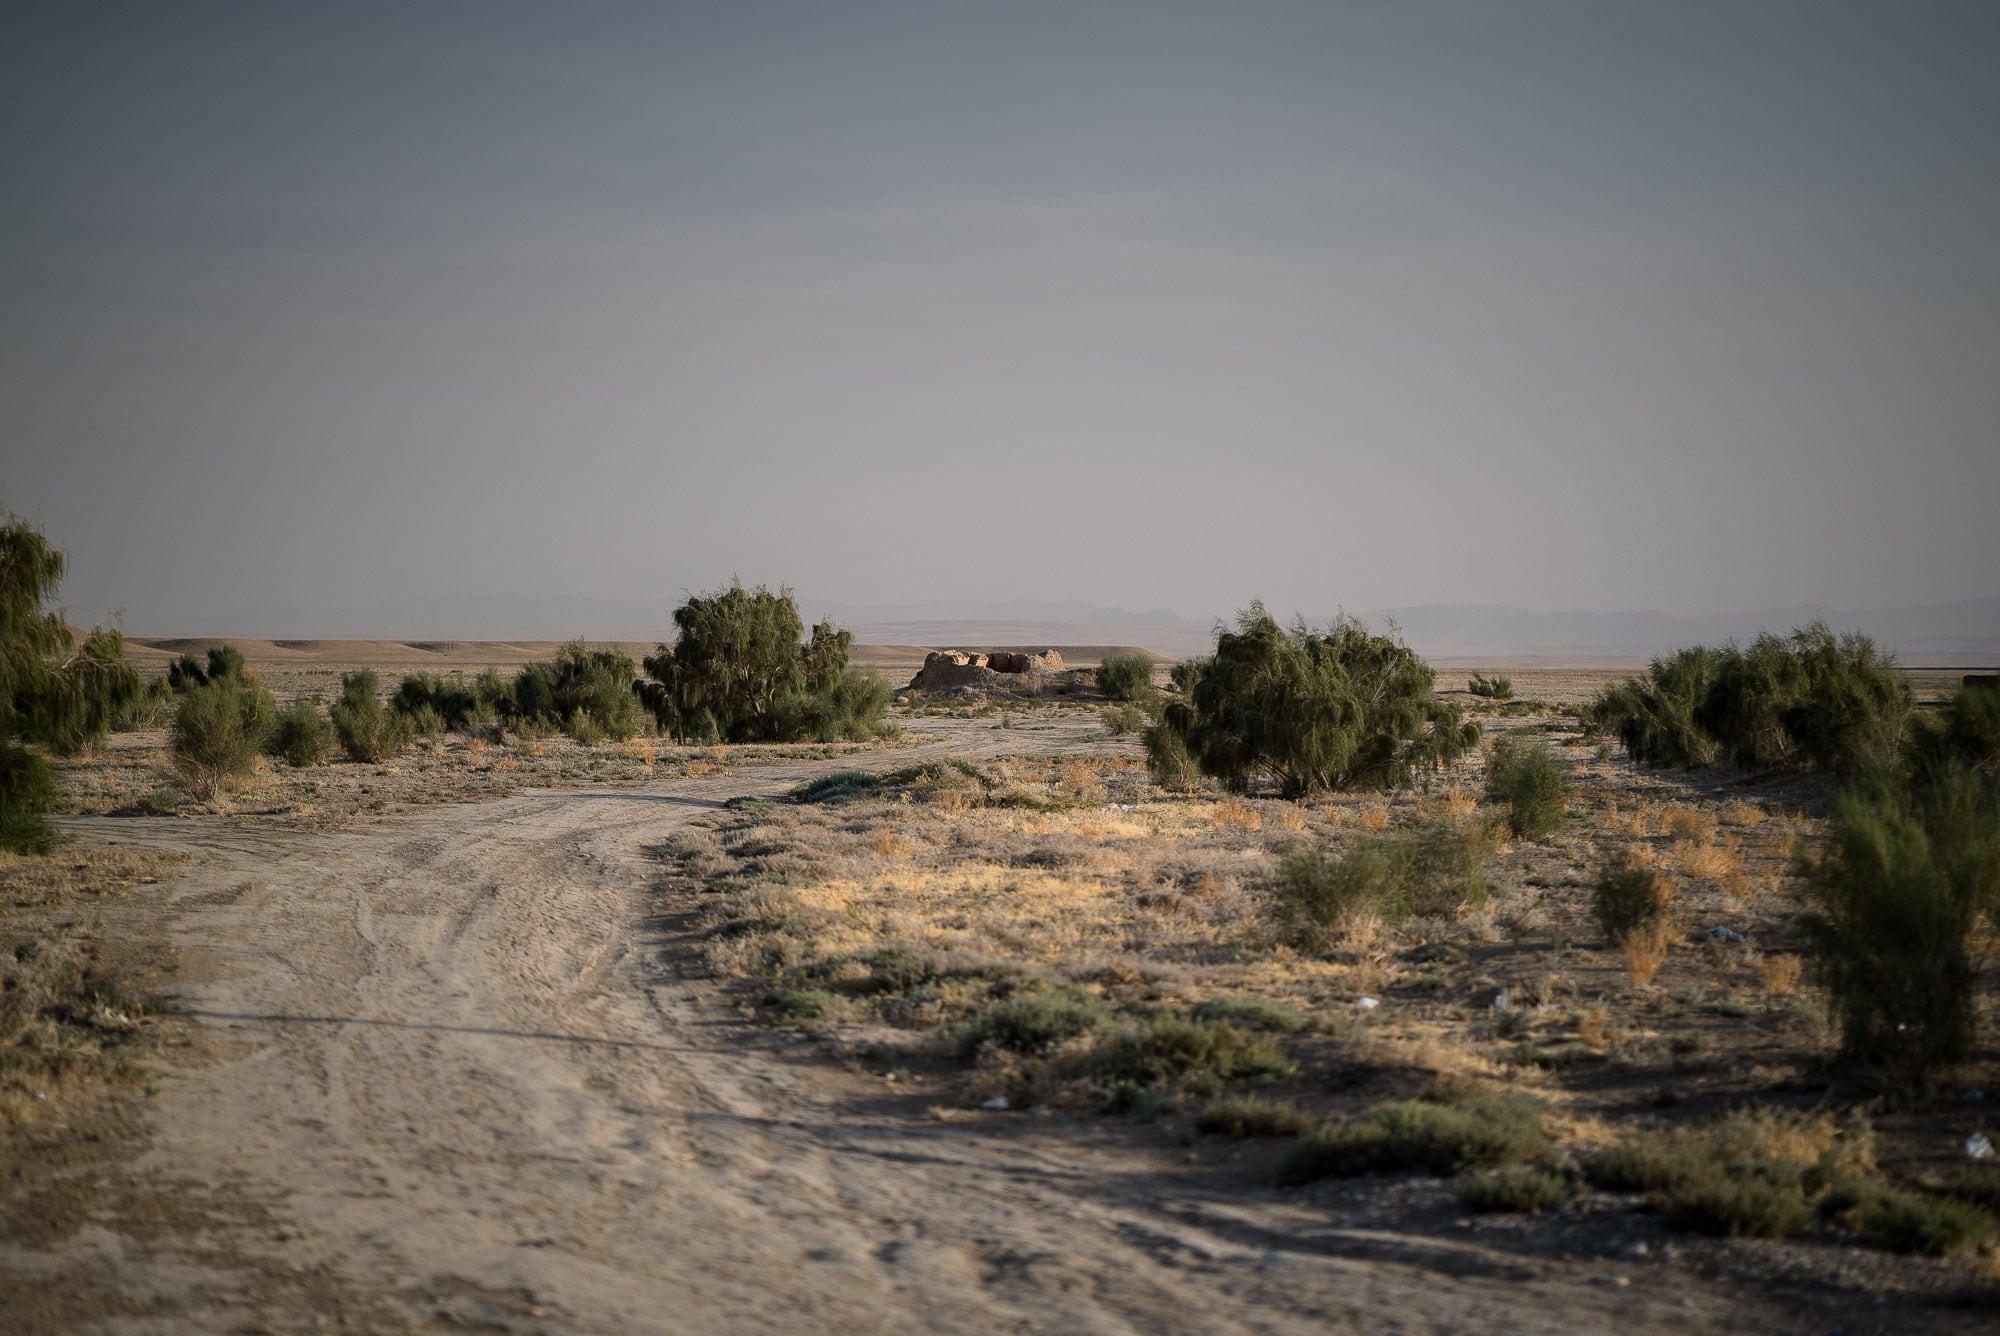 dirt track into the desert